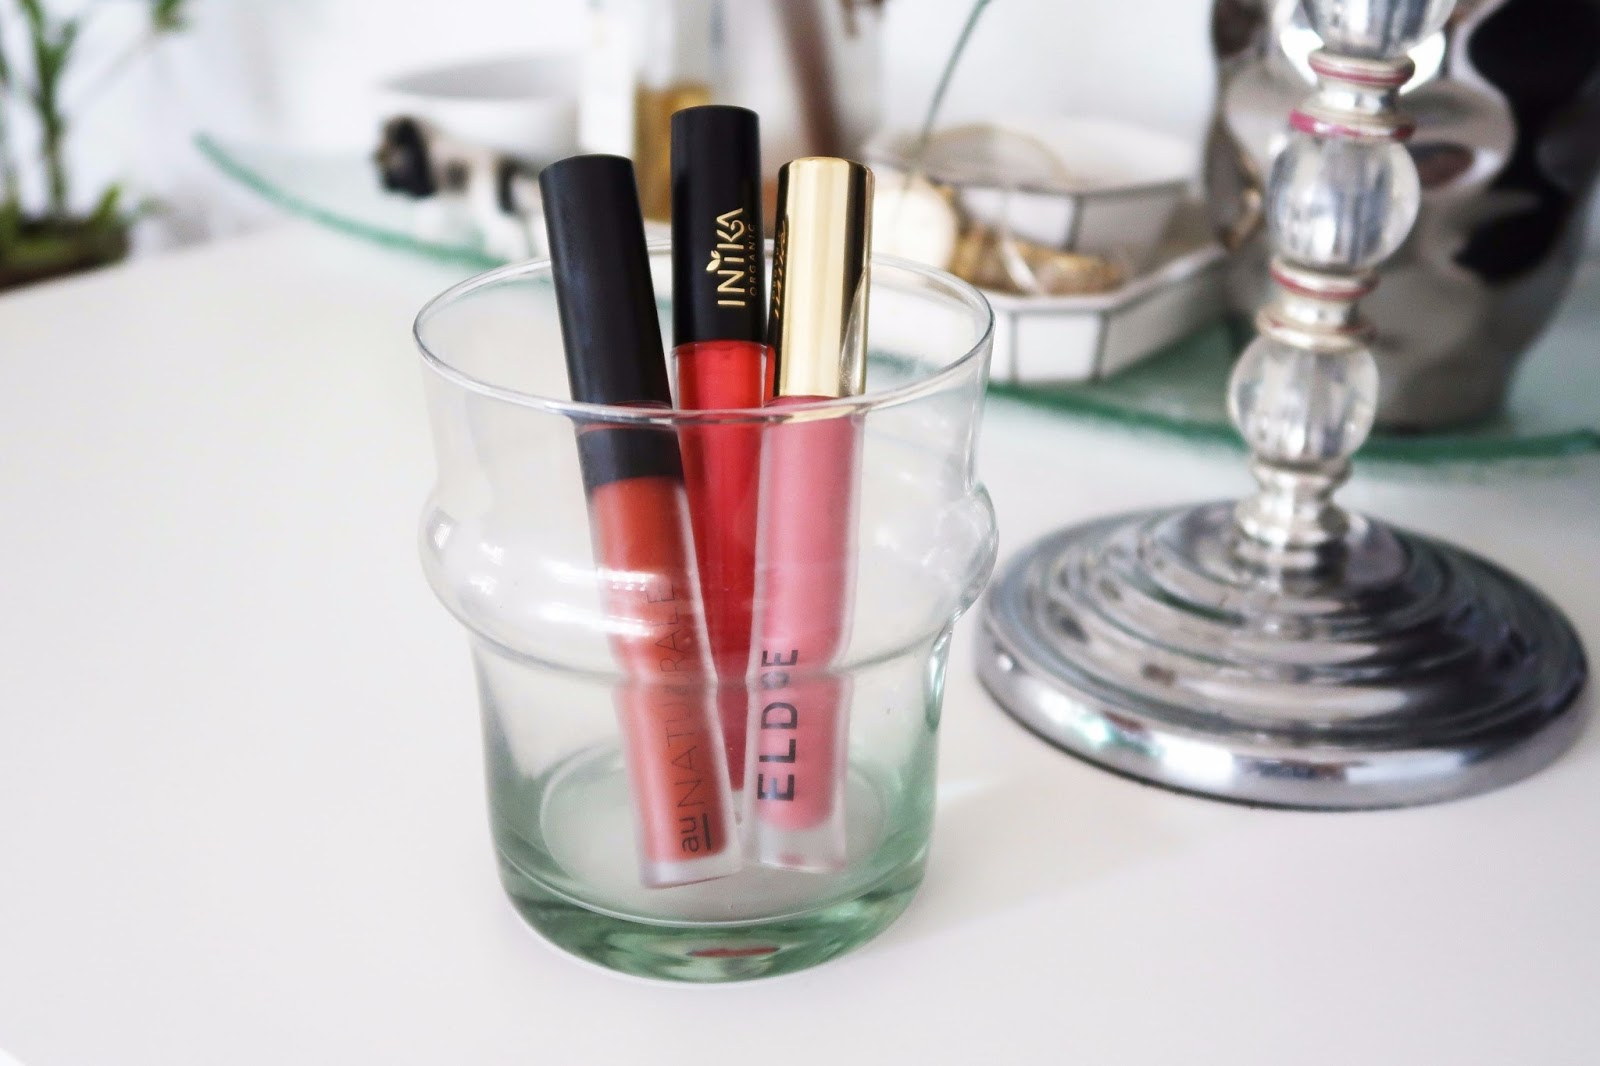 vegan lipsticks, vegan liquid lipstick, vegan lipgloss